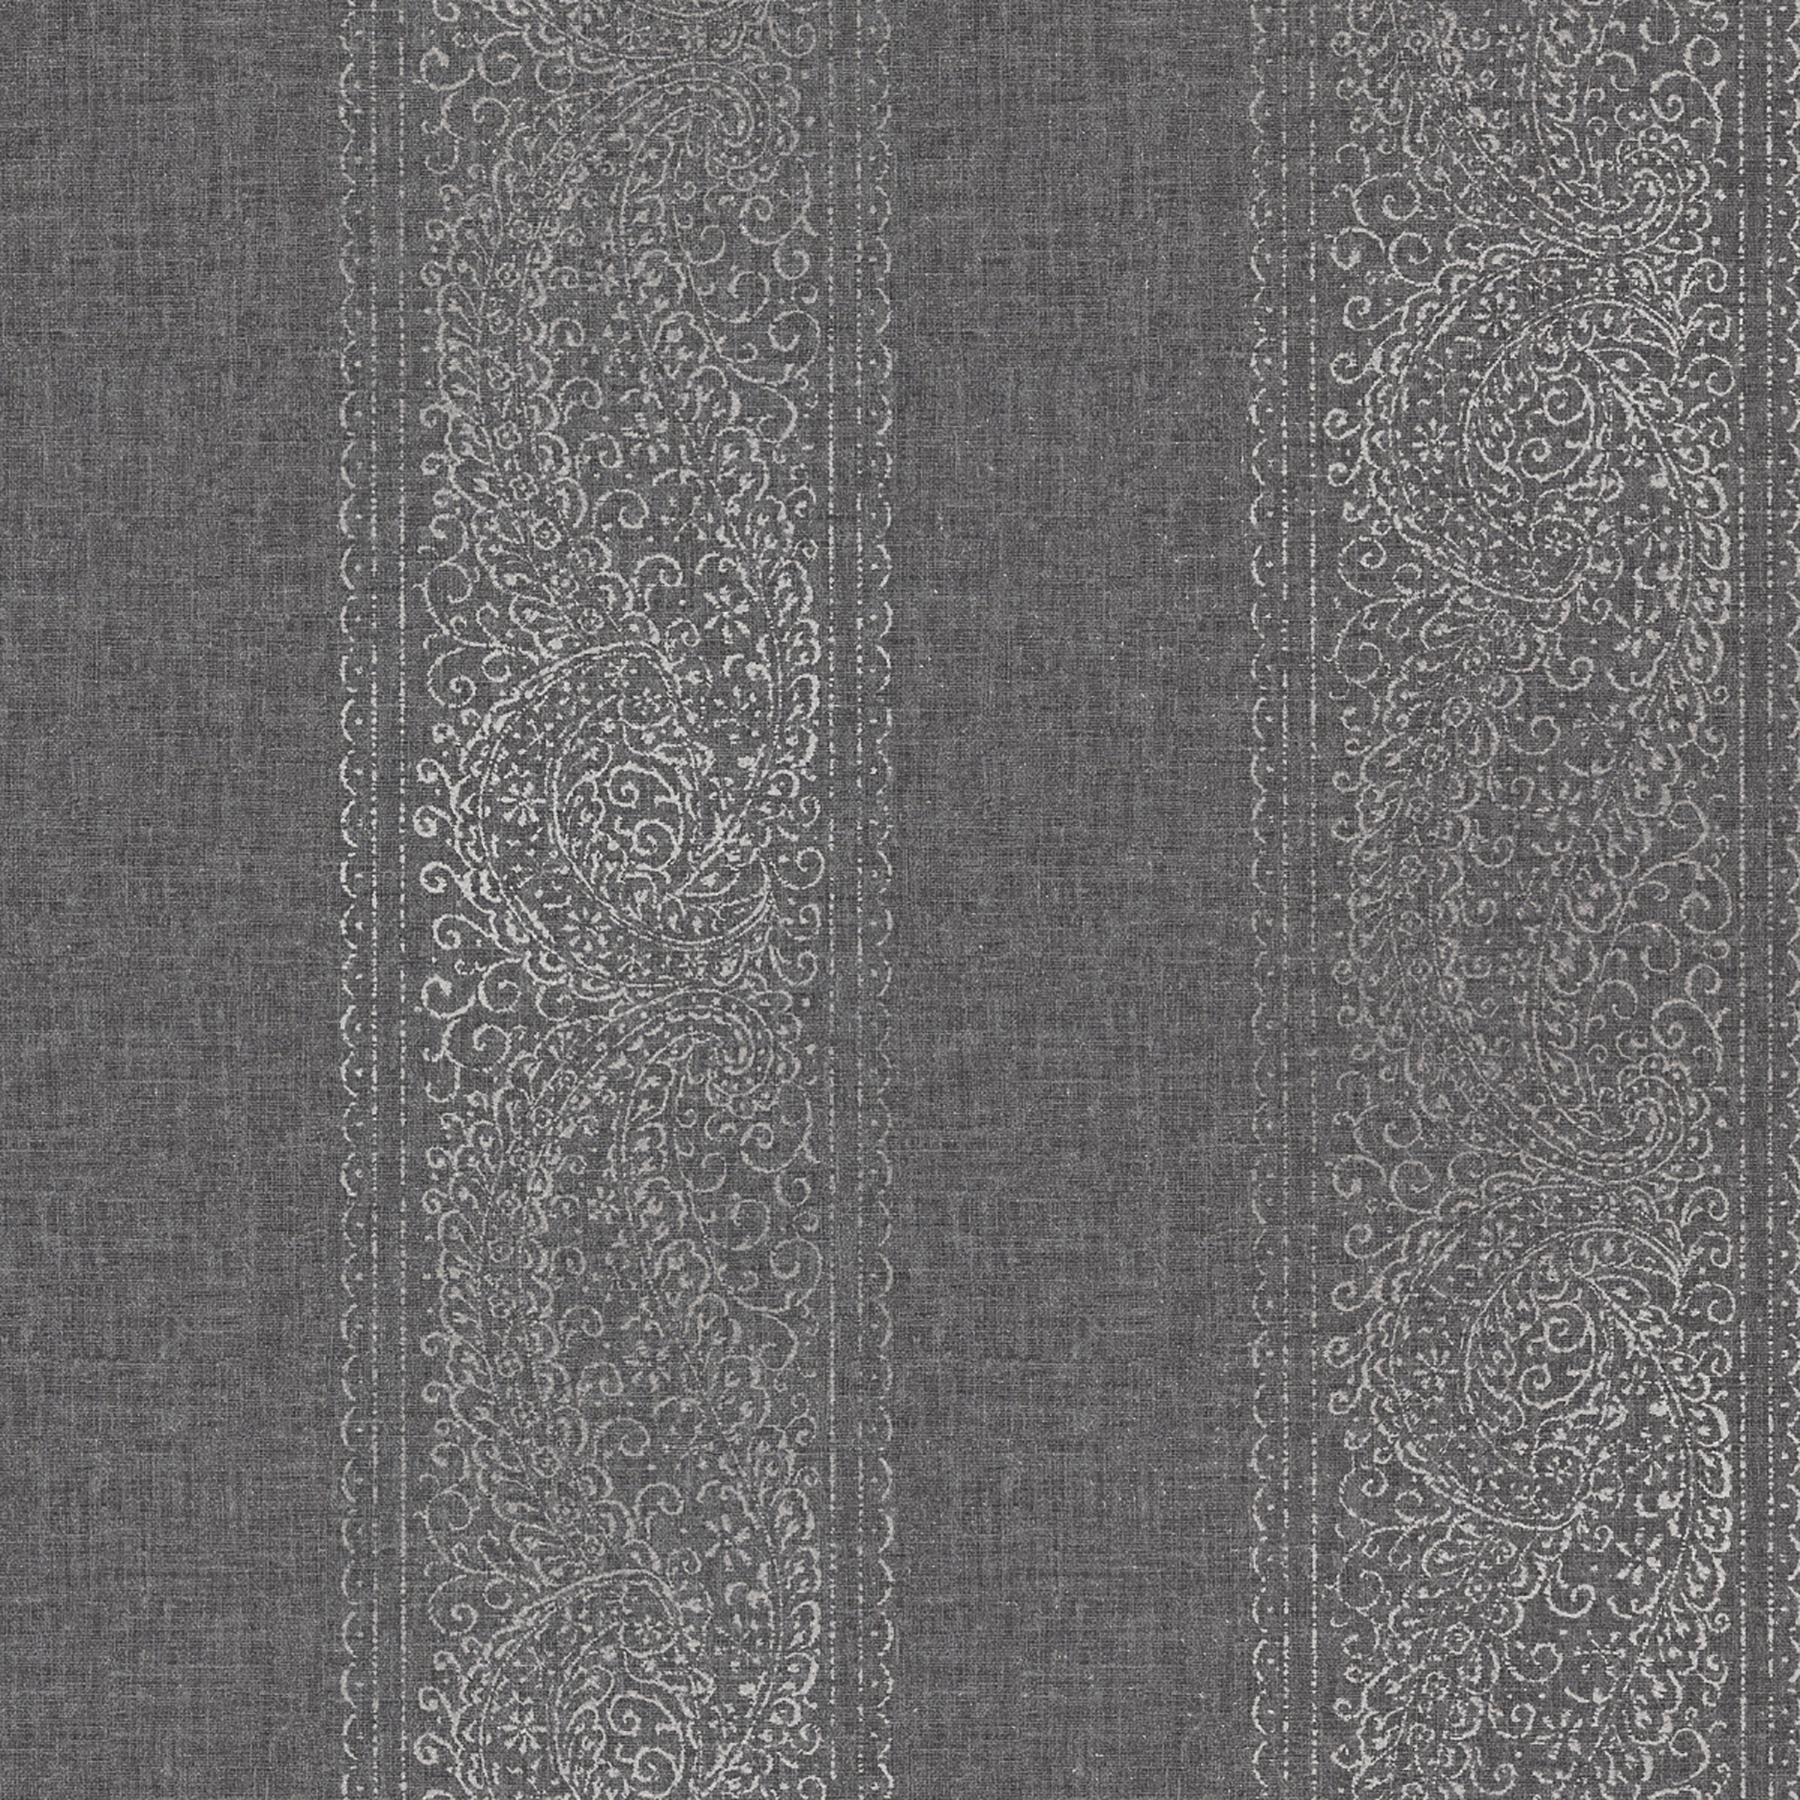 Picture of Arcades Black Paisley Stripe Wallpaper